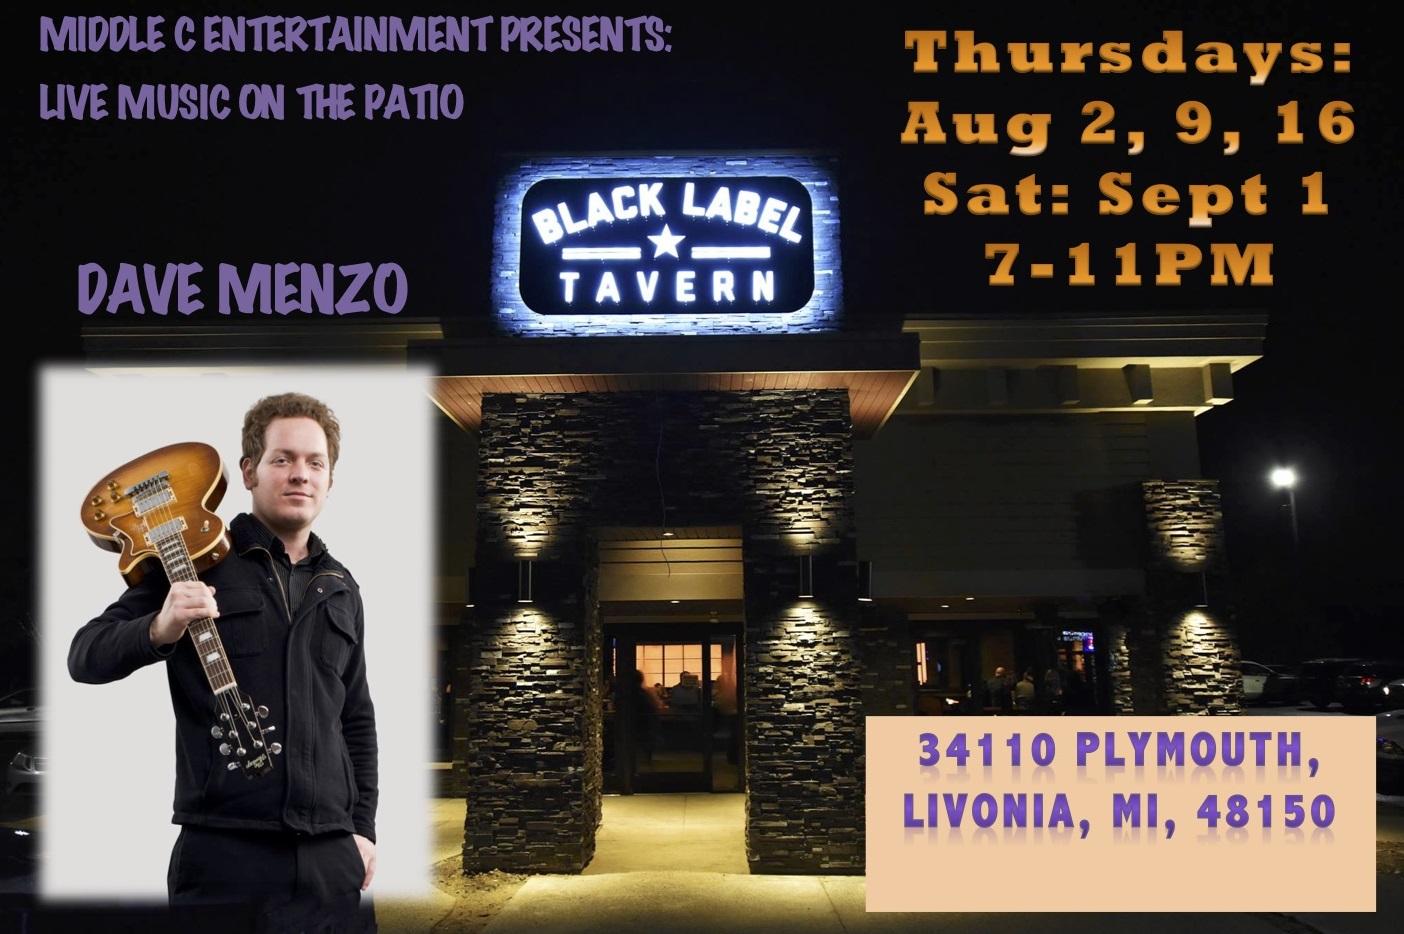 Middle C Ent presents: Thursday Night LIVE! at Black Label Tavern